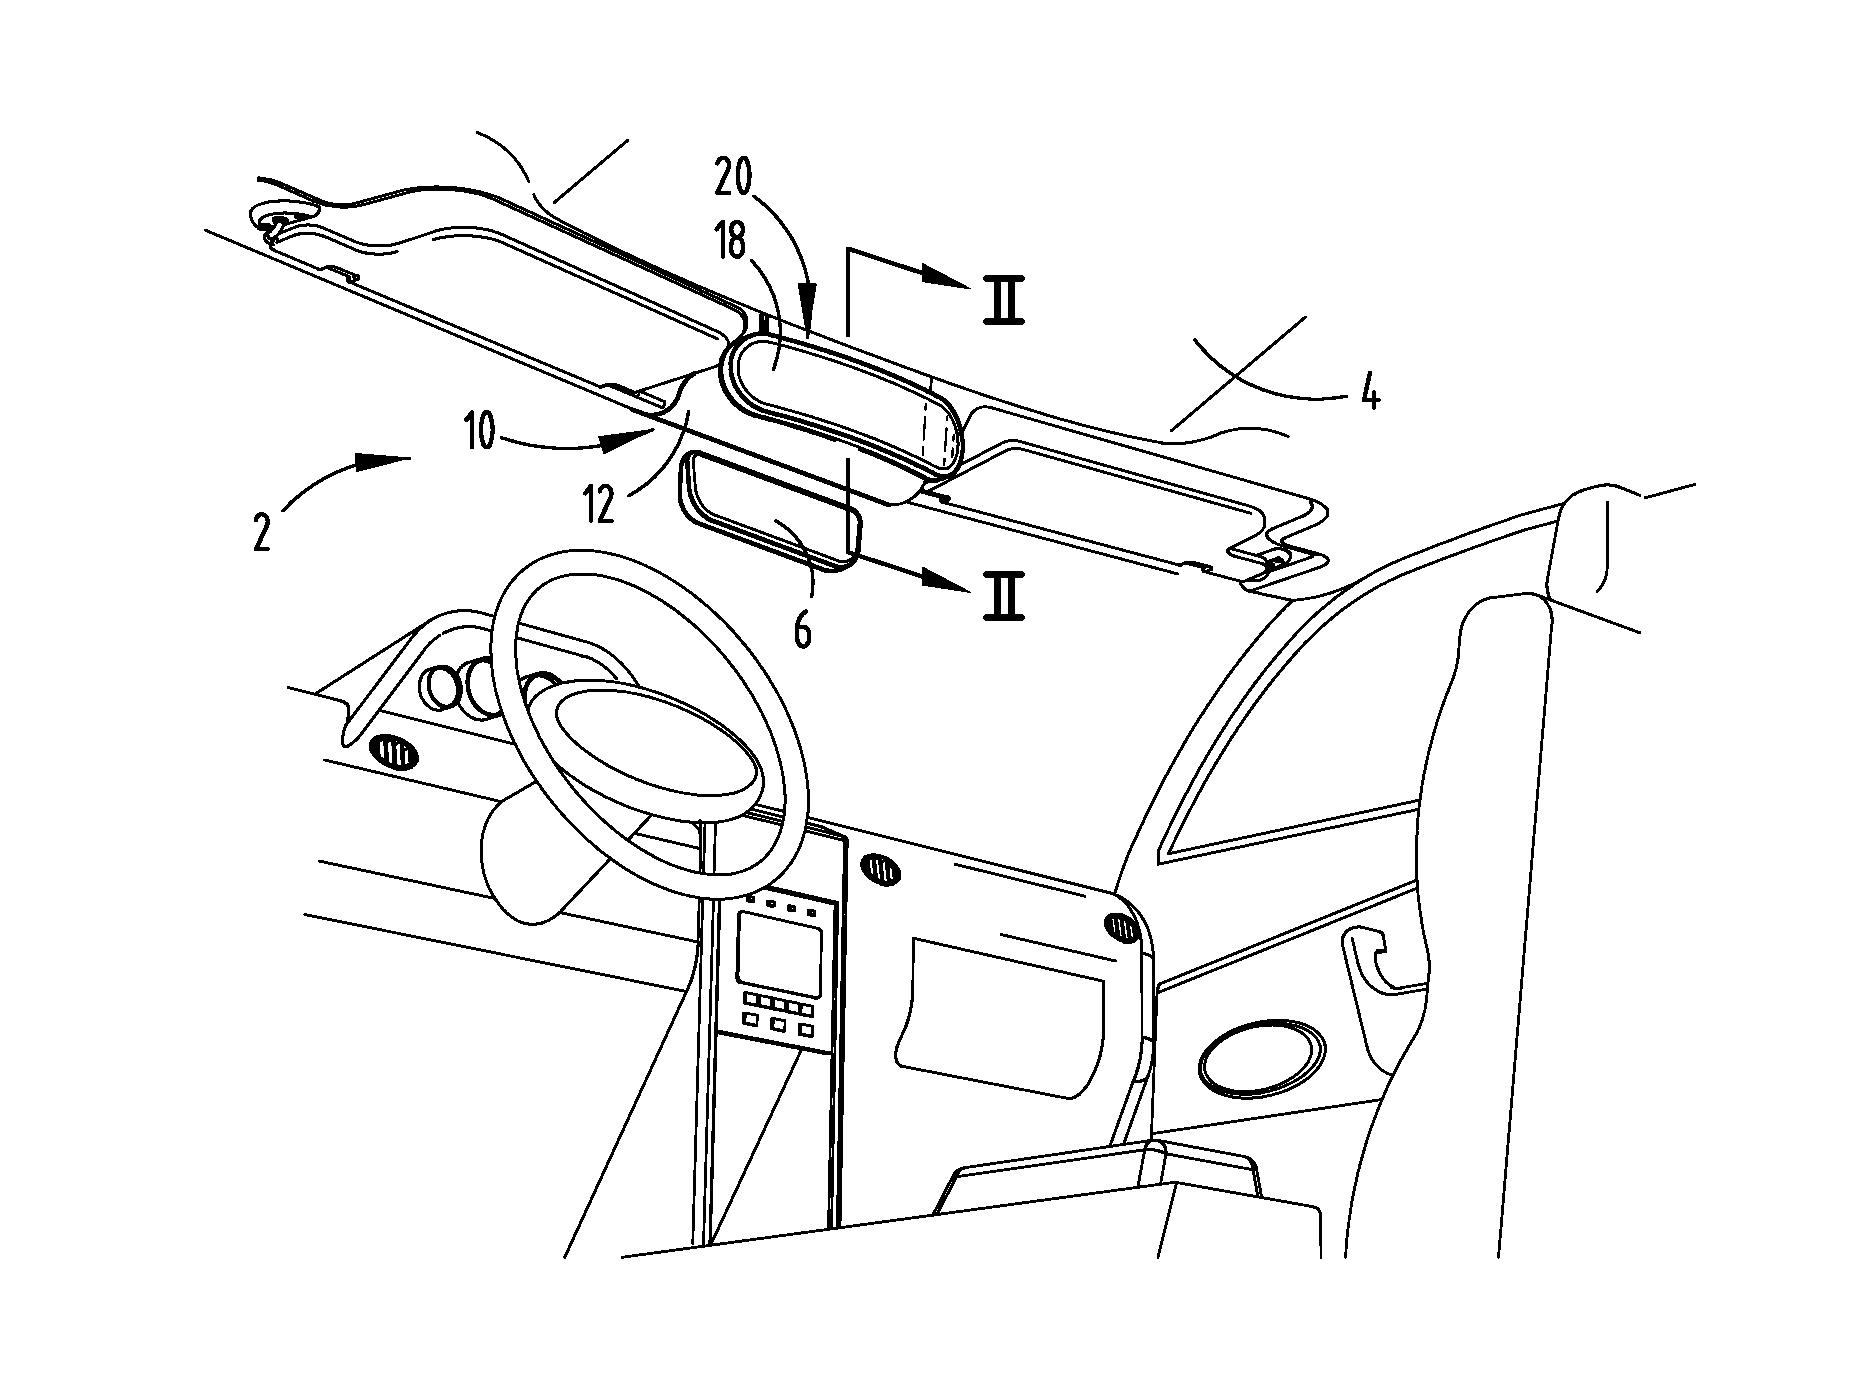 1865x1383 Patent Us20140192430